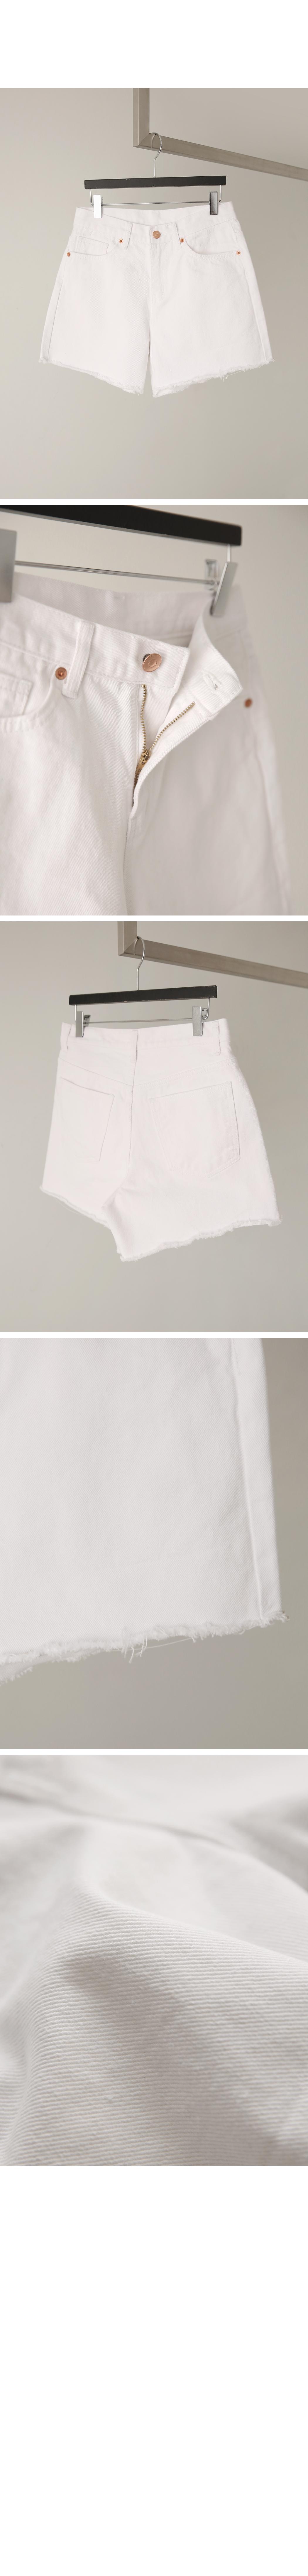 Vintage Cut 3.5 Shorts